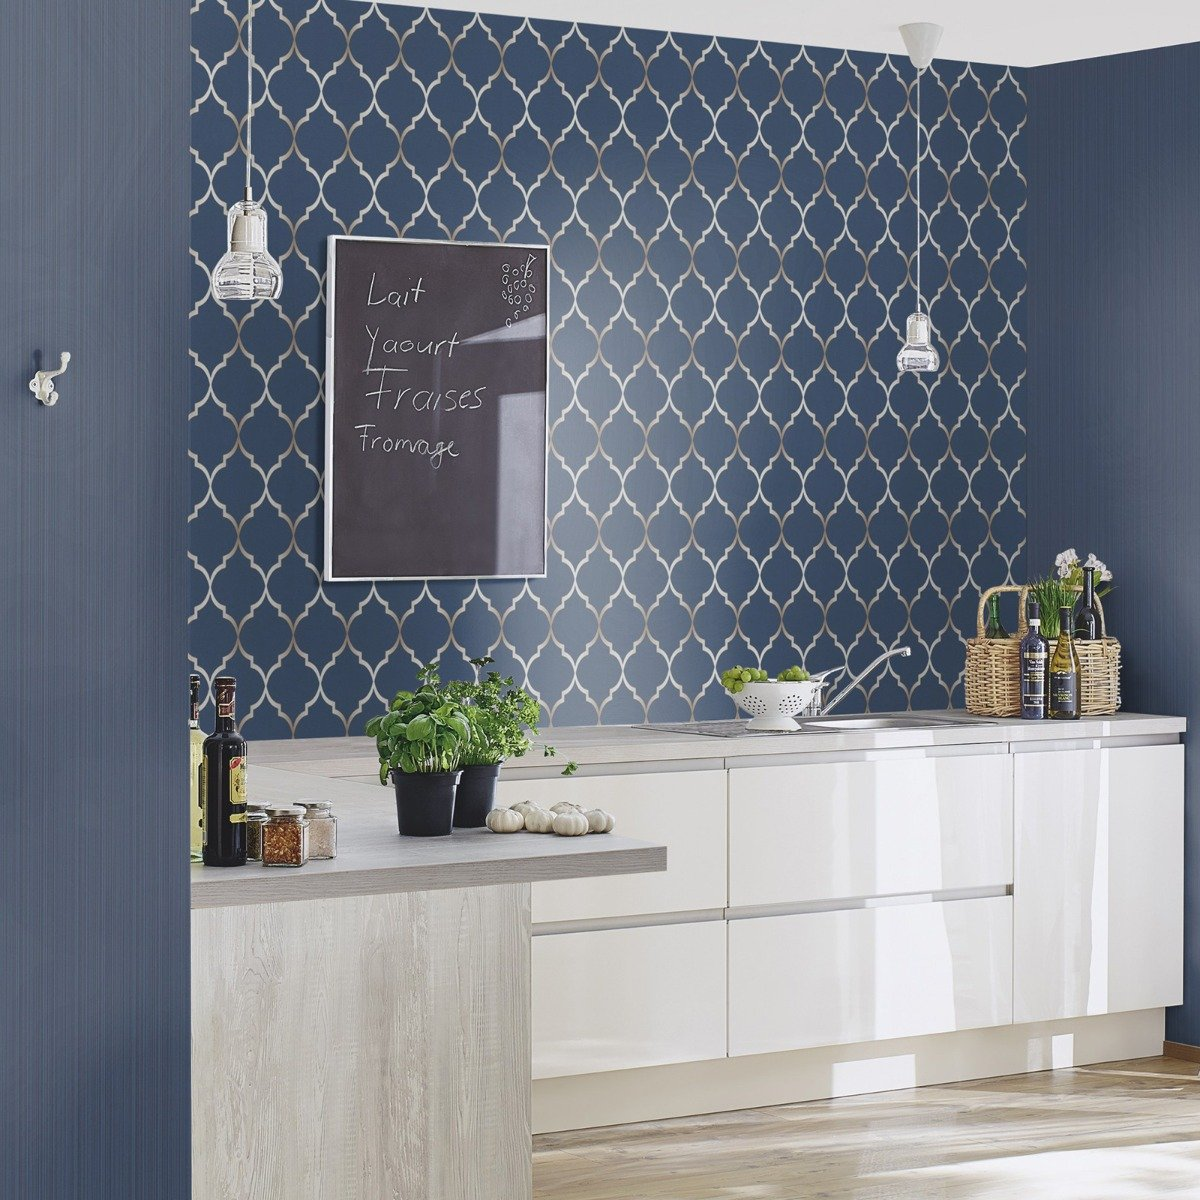 cucina-pareti-color-blu-navy-8